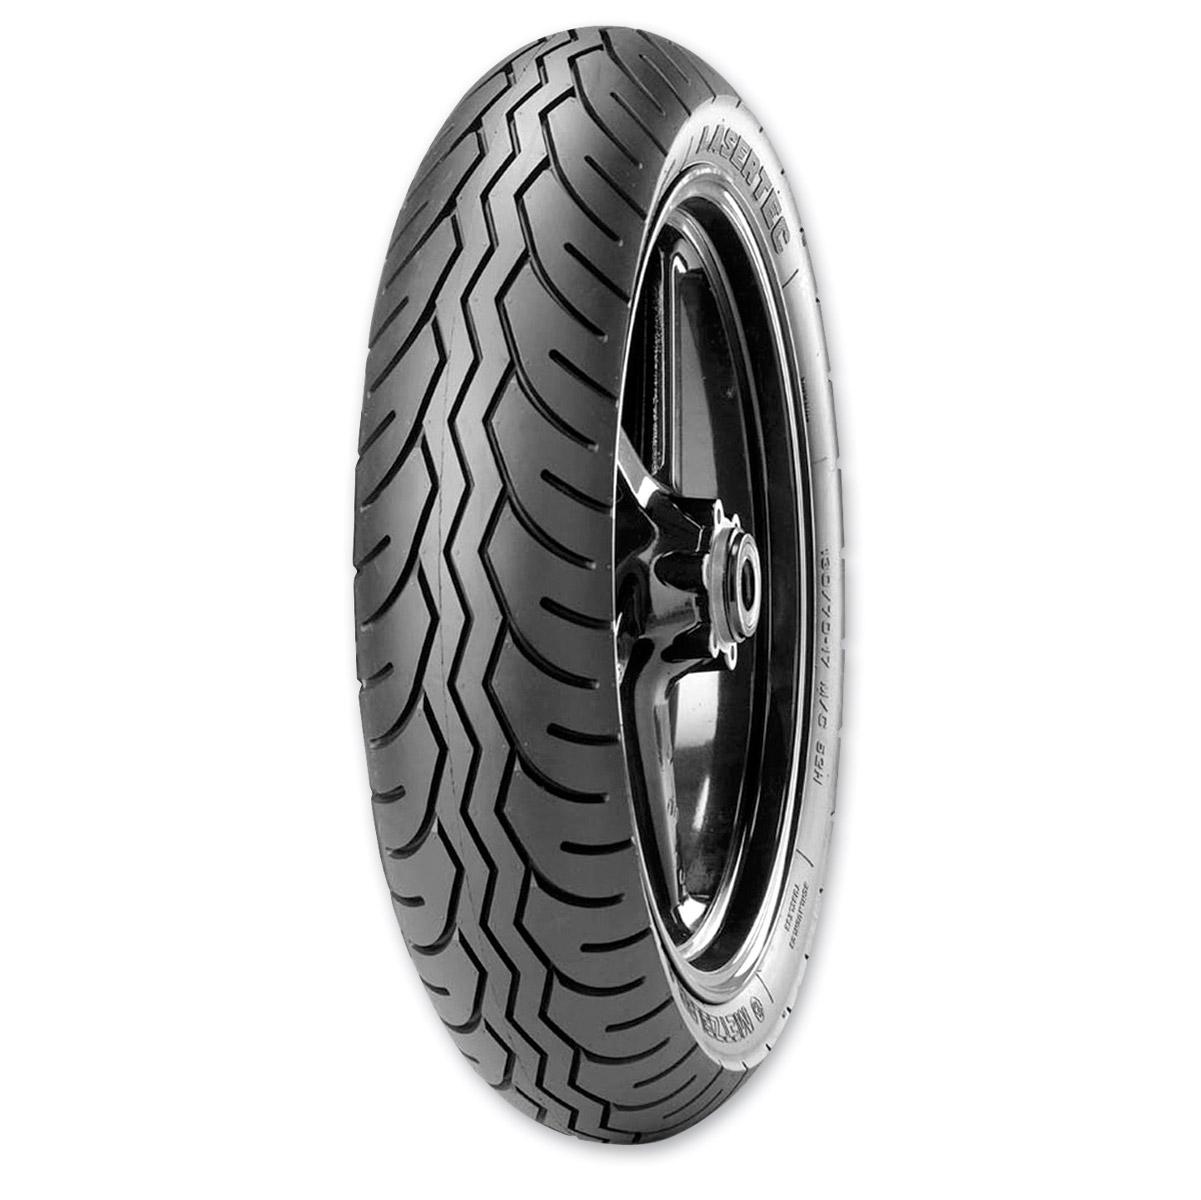 Metzeler Lasertec 120/90-18 Rear Tire